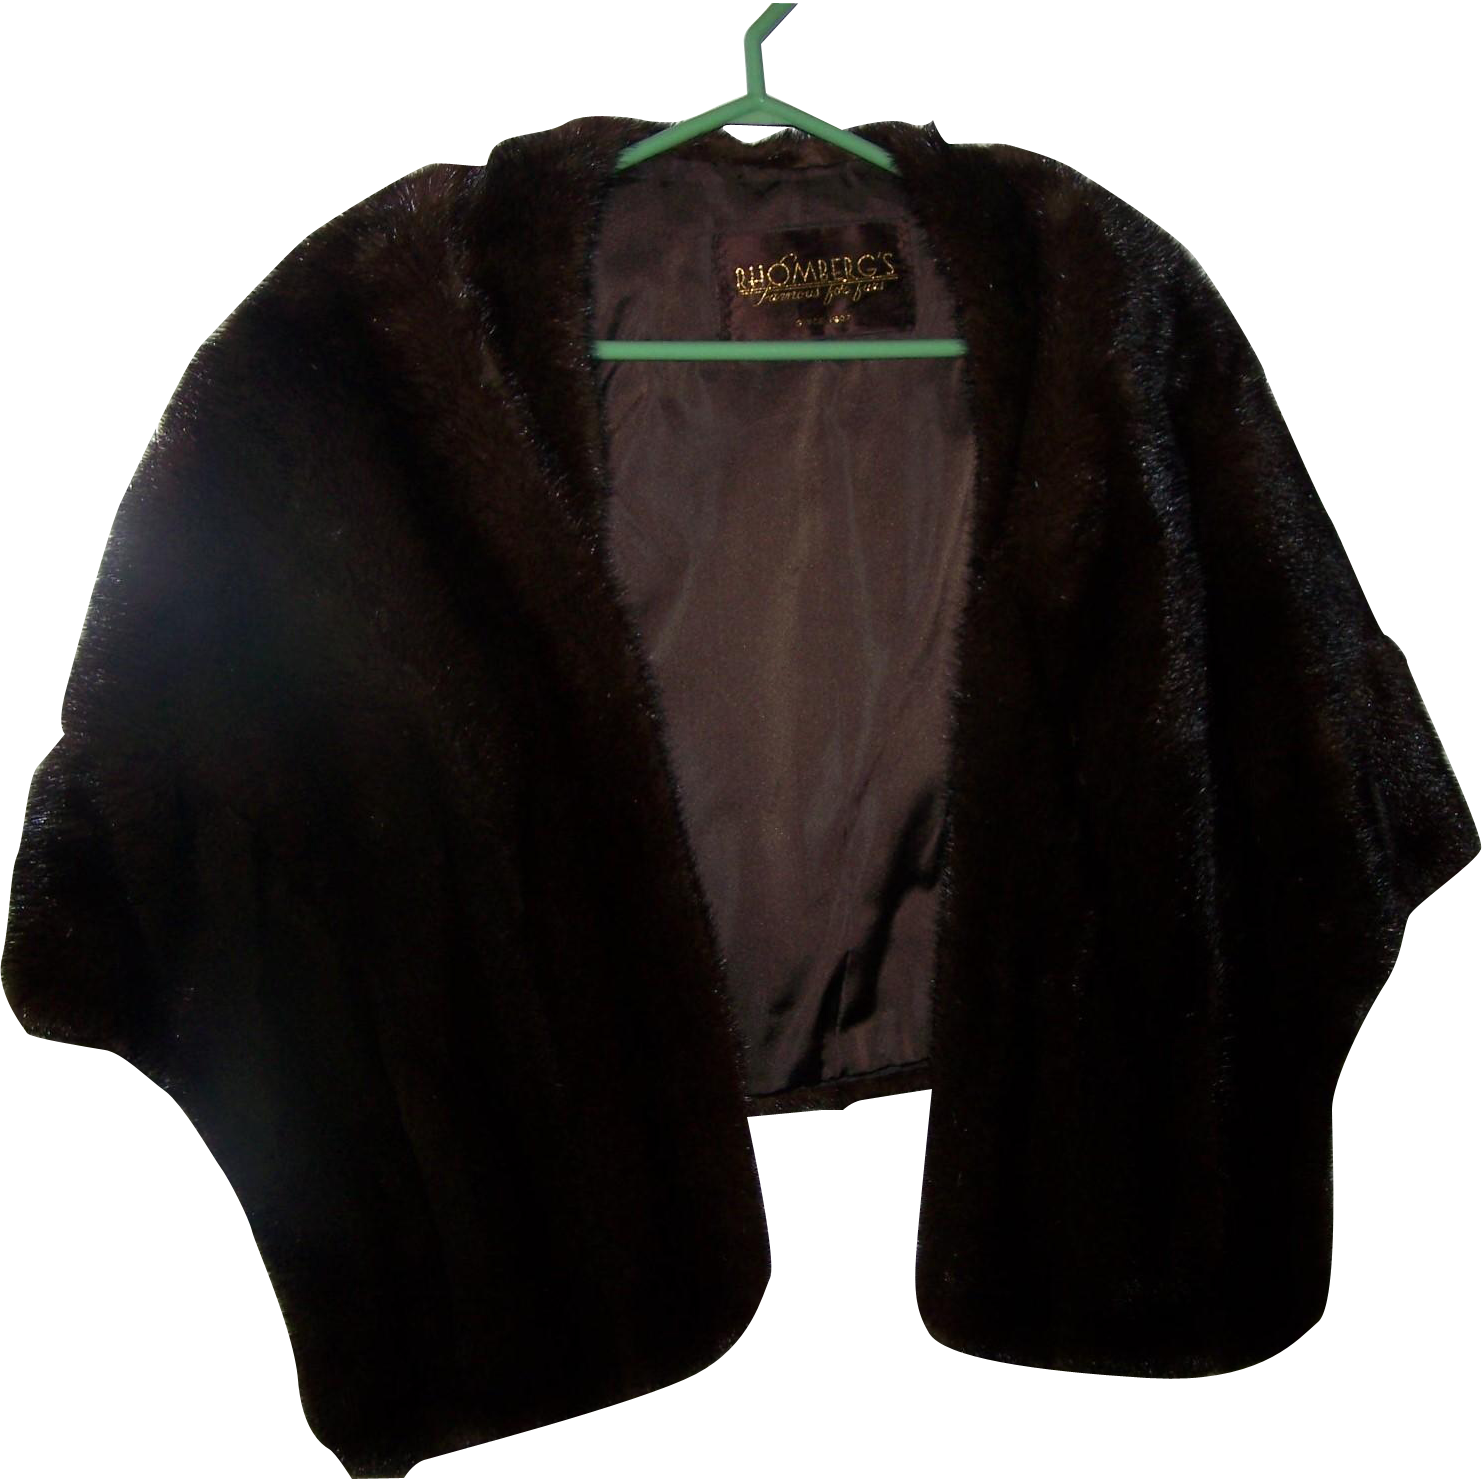 Mid Century Quality Mink / Muskrat Fur Shrug Stole RHOMBERG'S